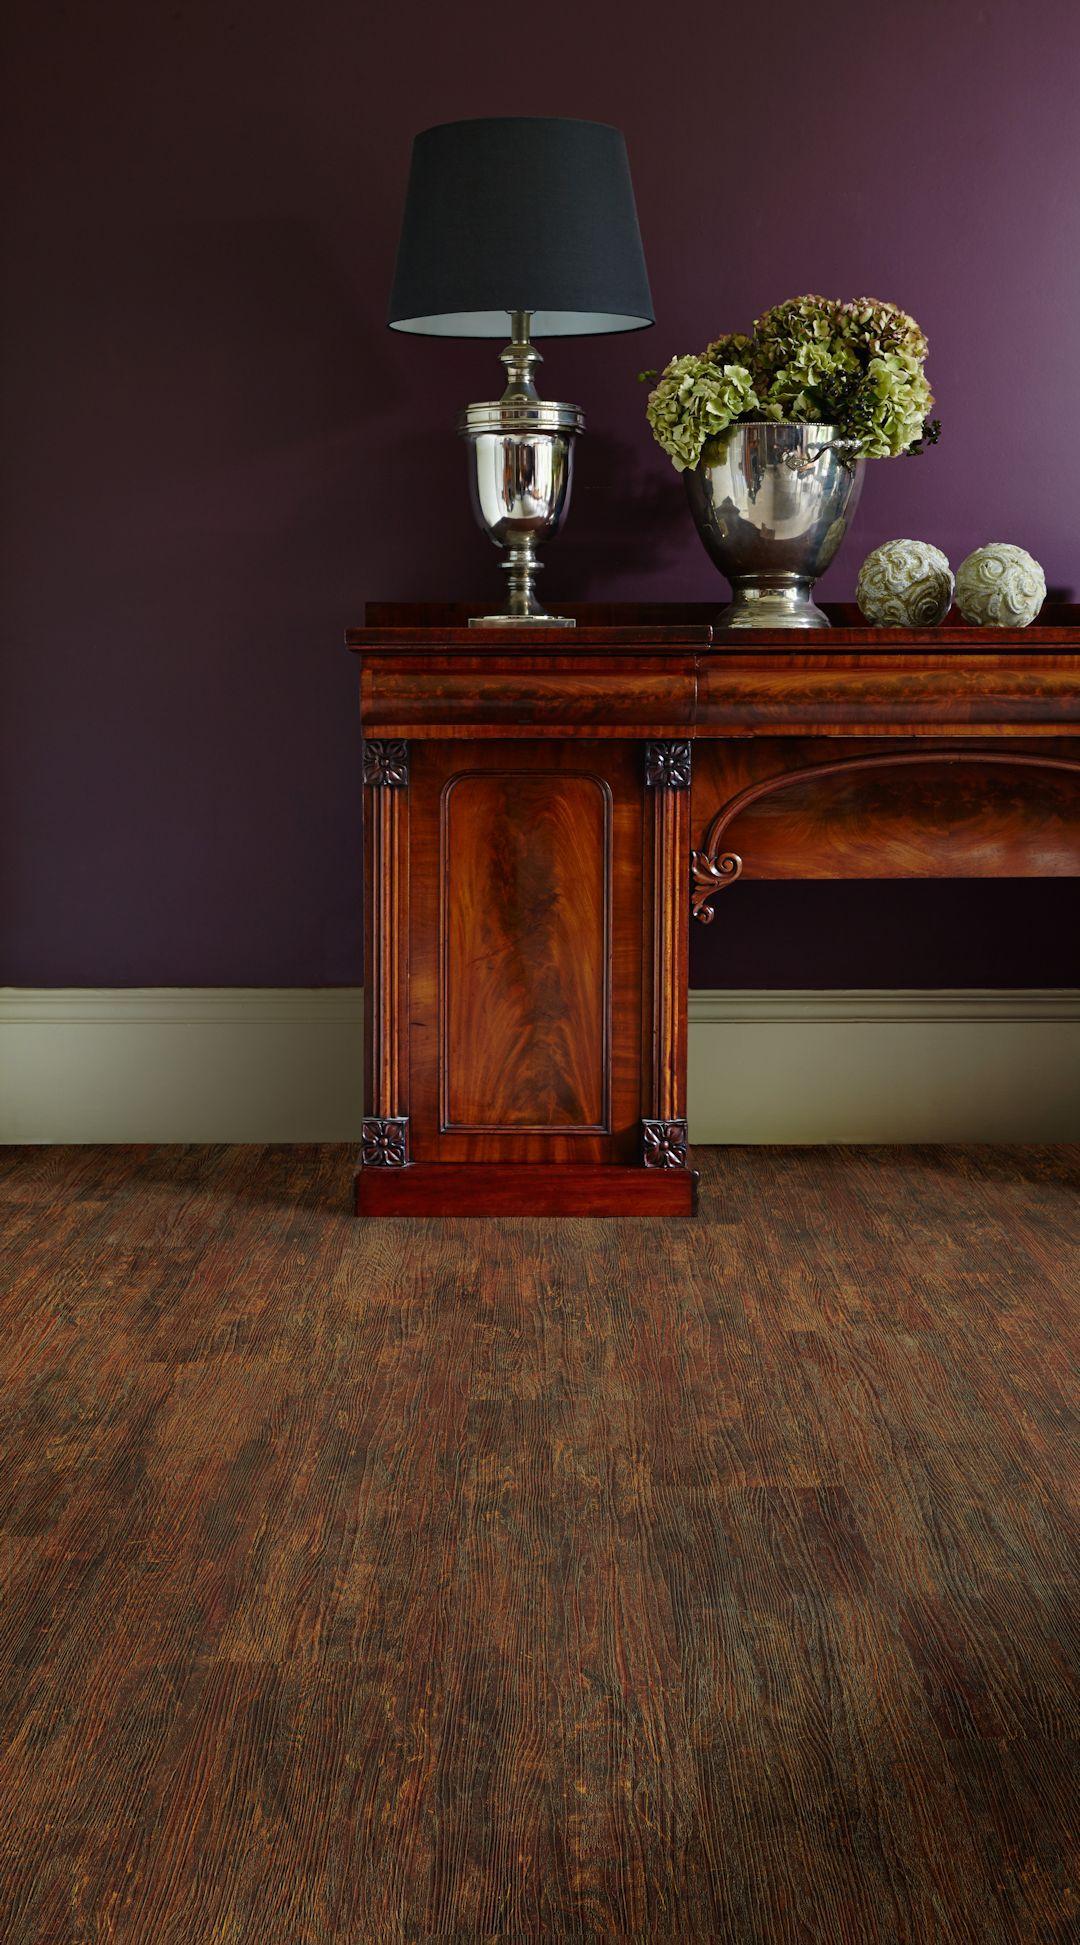 Heritage oak camaro luxury vinyl tile flooring in hallway vinyl heritage oak camaro luxury vinyl tile flooring in hallway dailygadgetfo Image collections